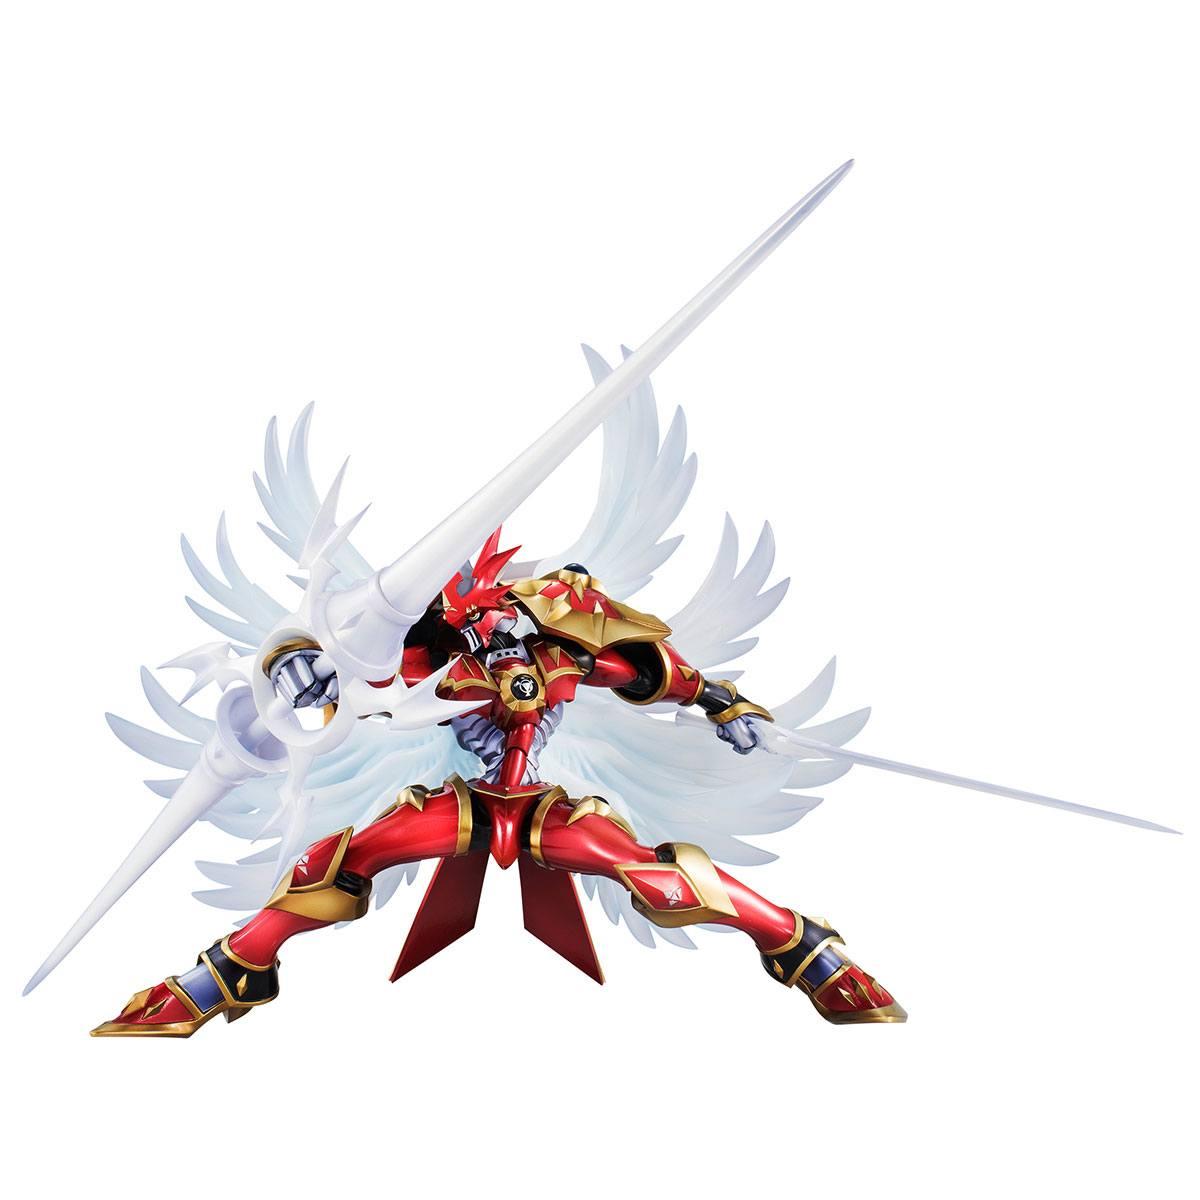 Digimon Tamers G.E.M. Series PVC Statue Dukemon Crimson Mode 18 cm